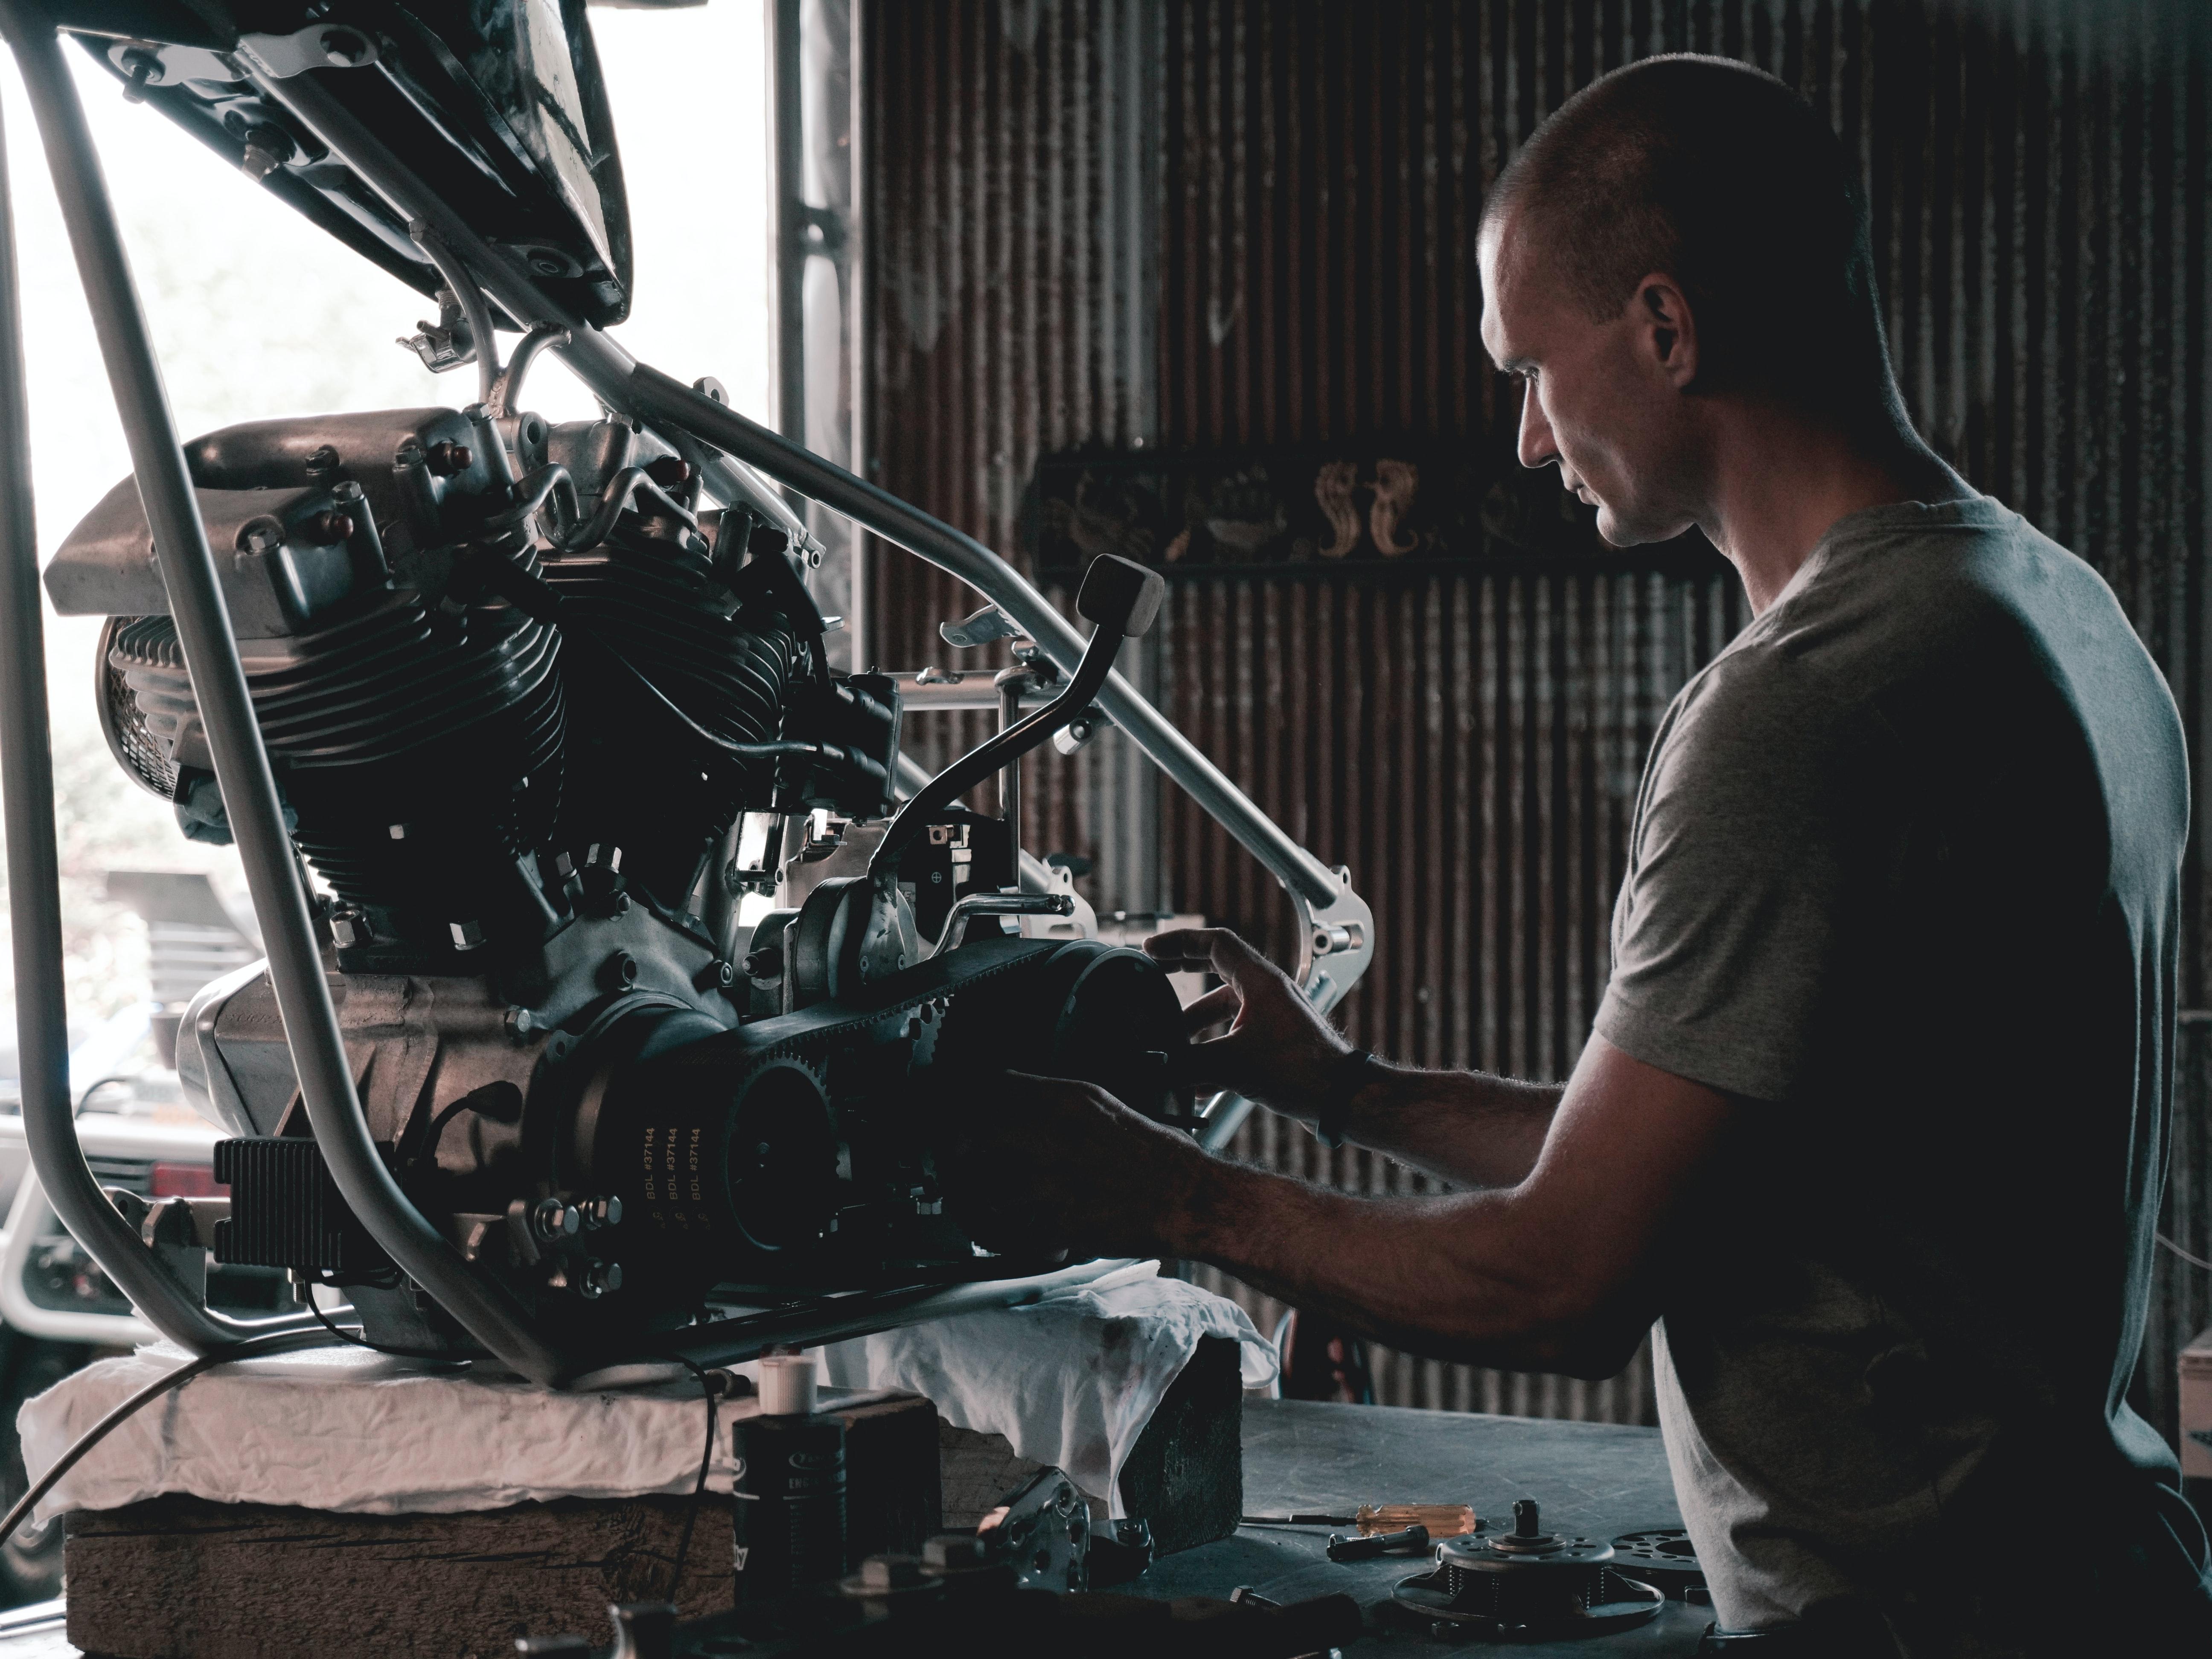 The Best Mechanics Auto Repair in Belgrade | Belgrade at night